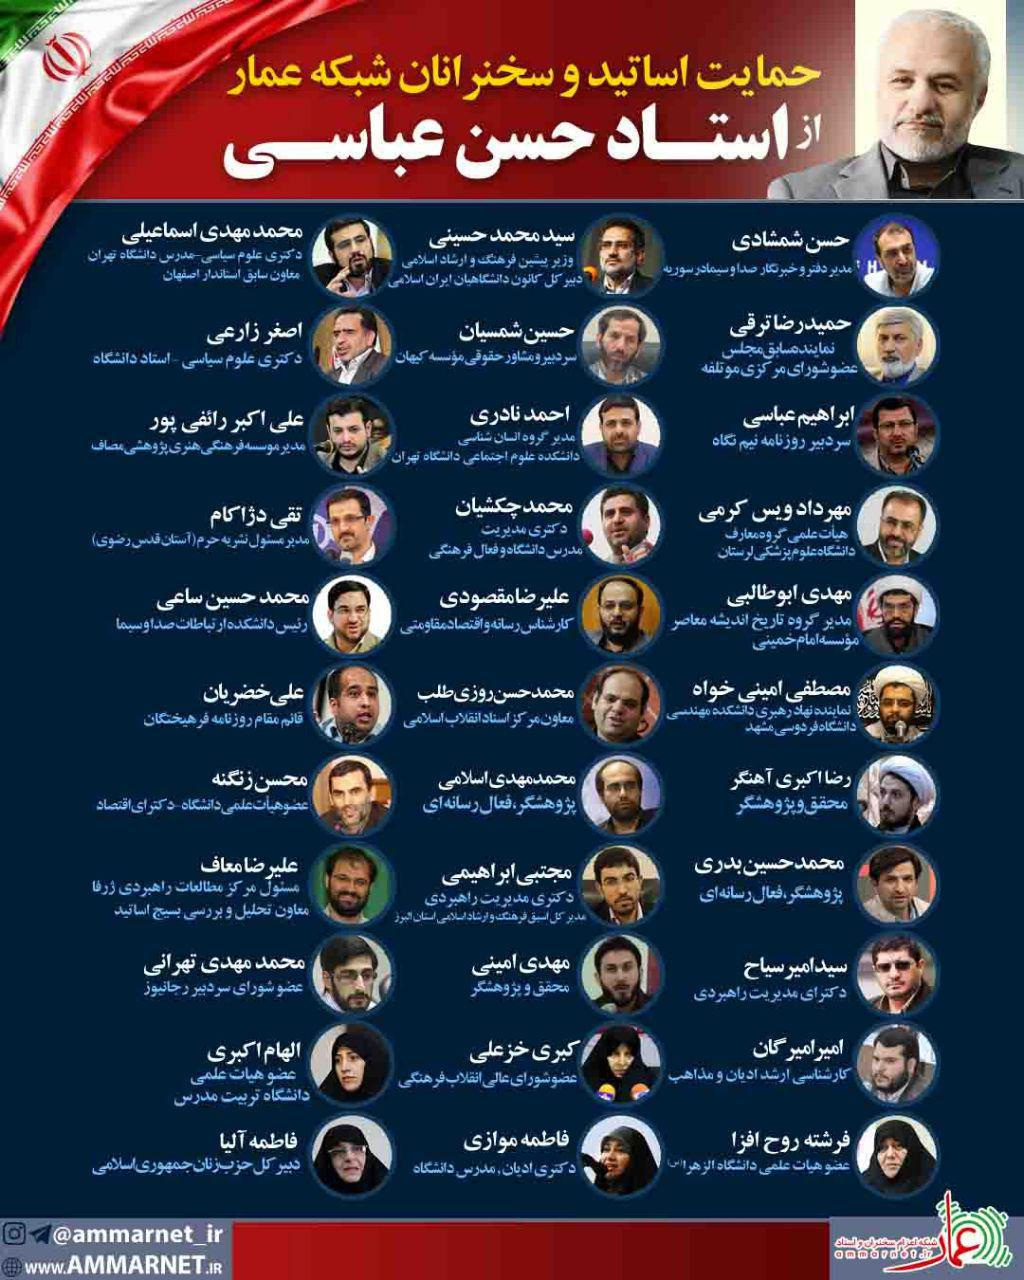 photo 07 24 مواضع جمعی از اهالی هنر و همچنين رسانه انقلاب در خصوص حکم حبس استاد حسن عباسی